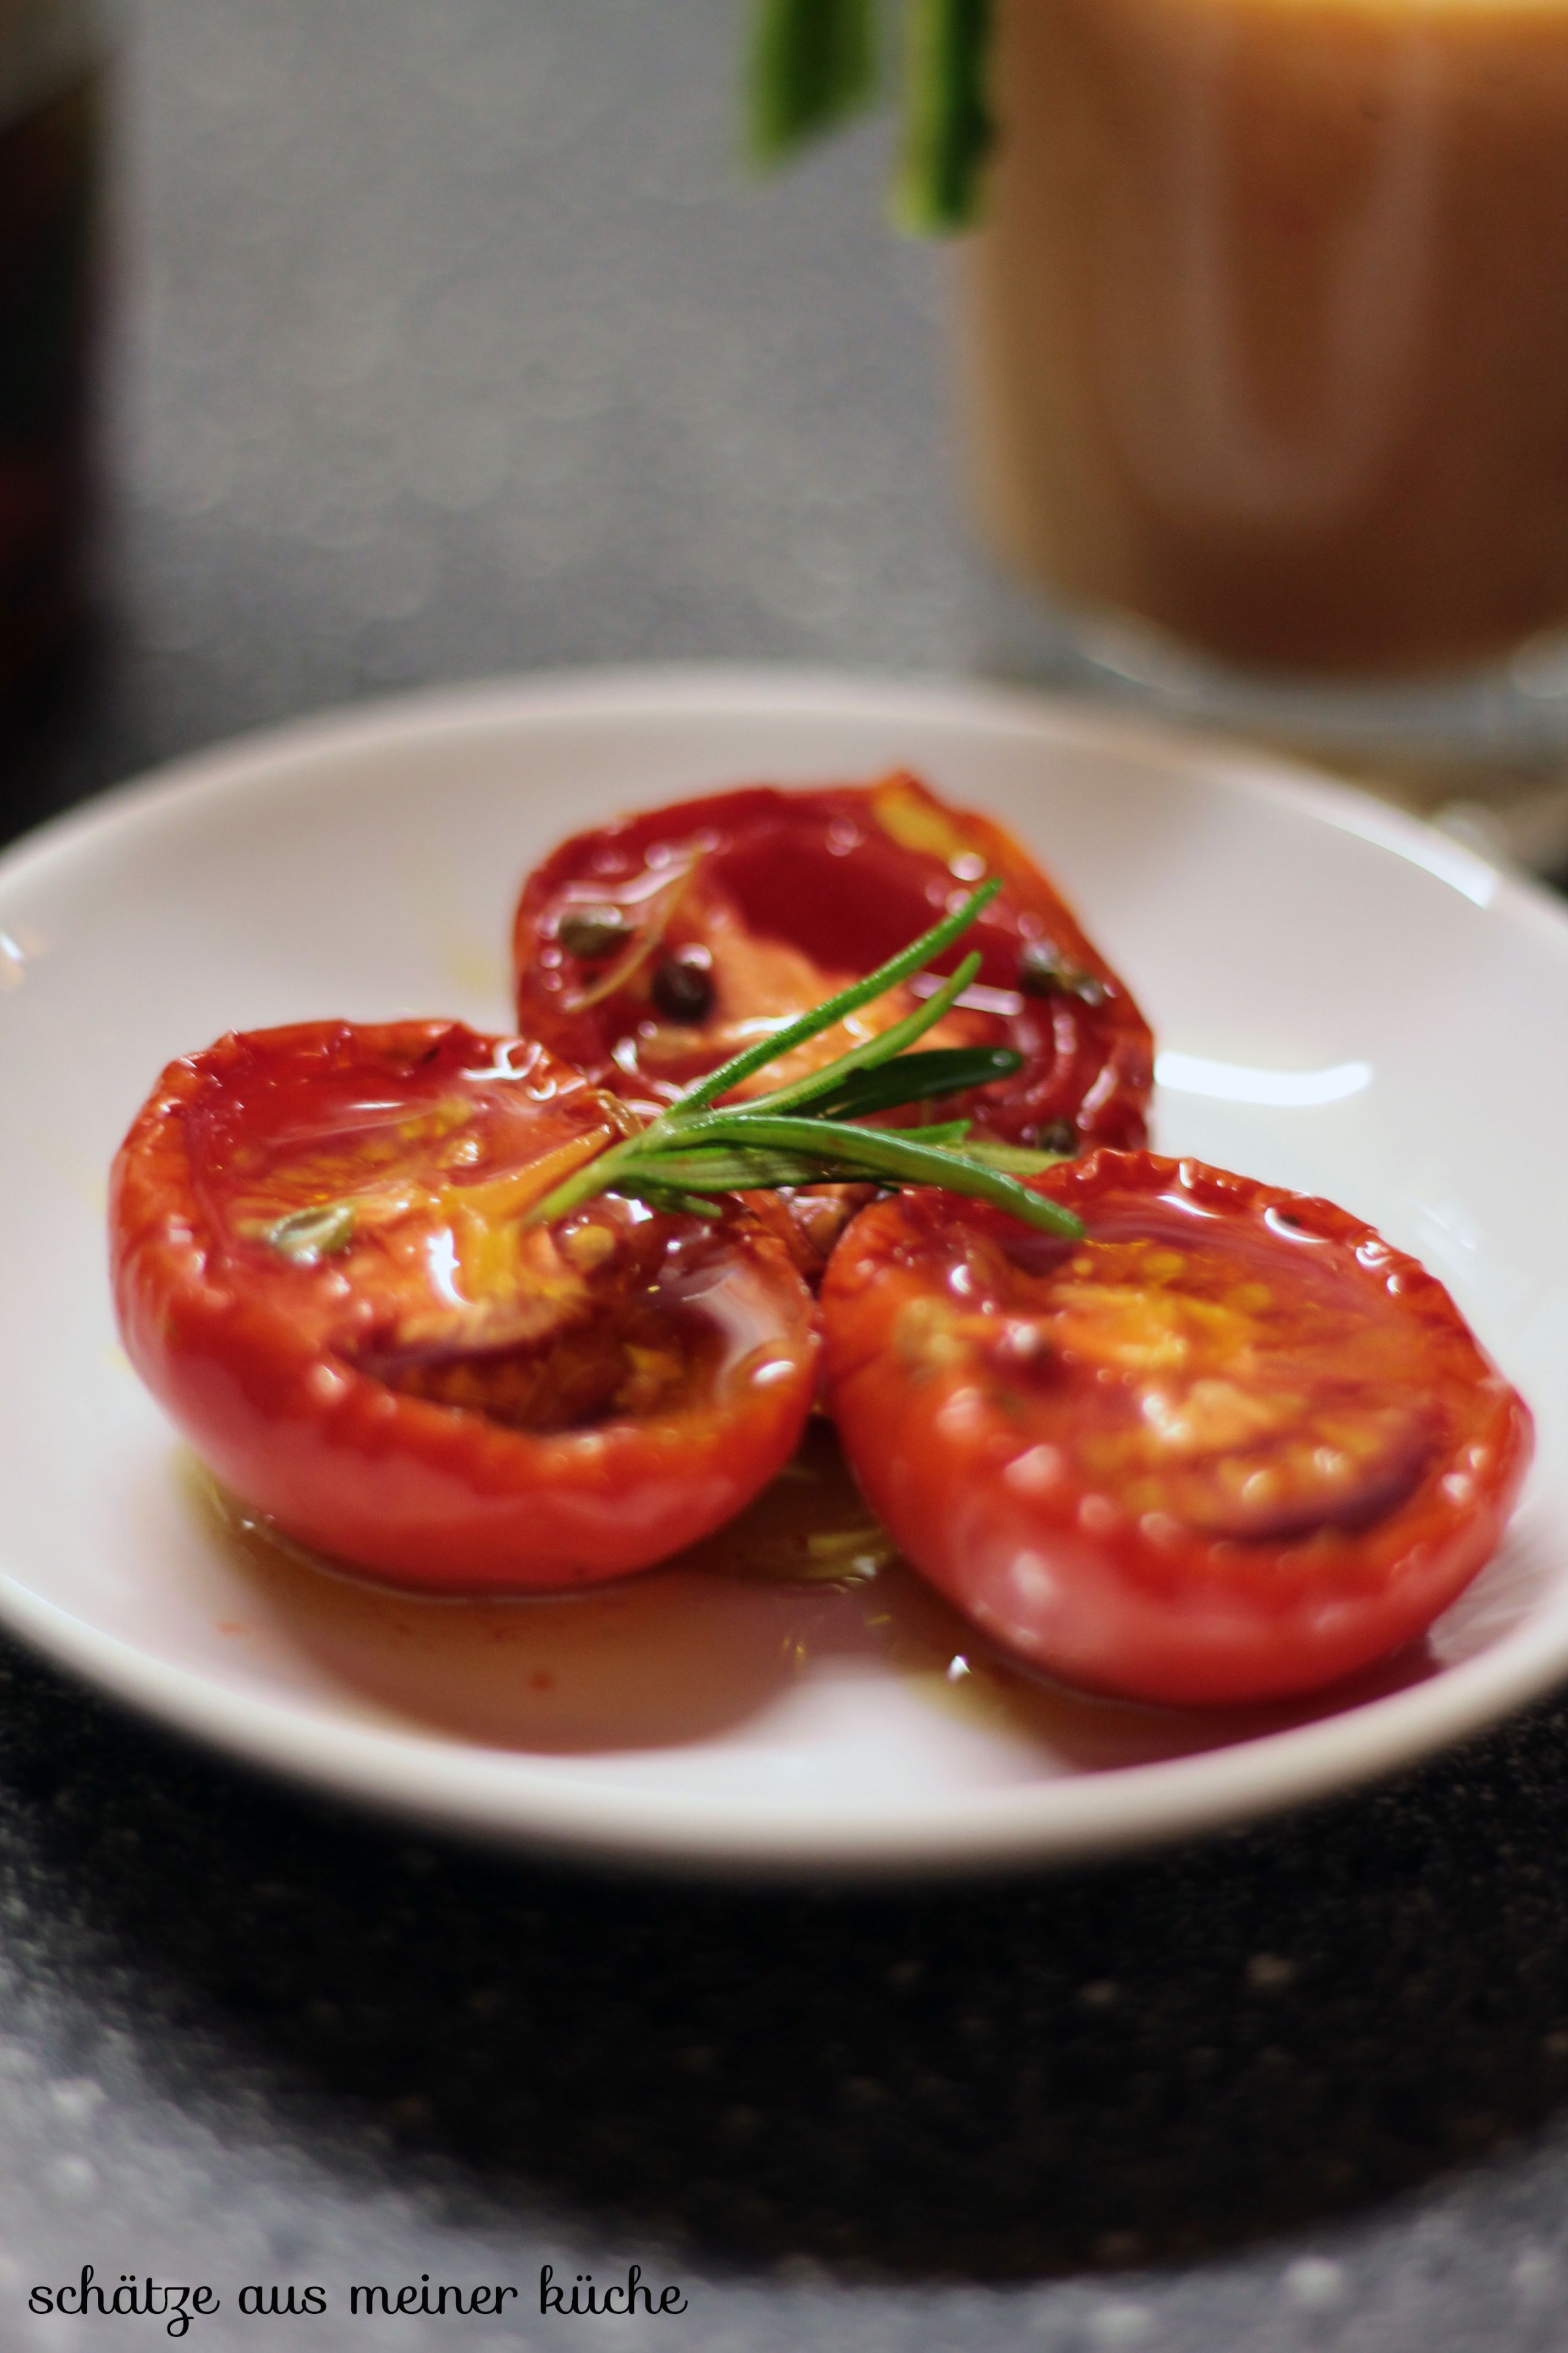 Halbgetrocknete Tomaten